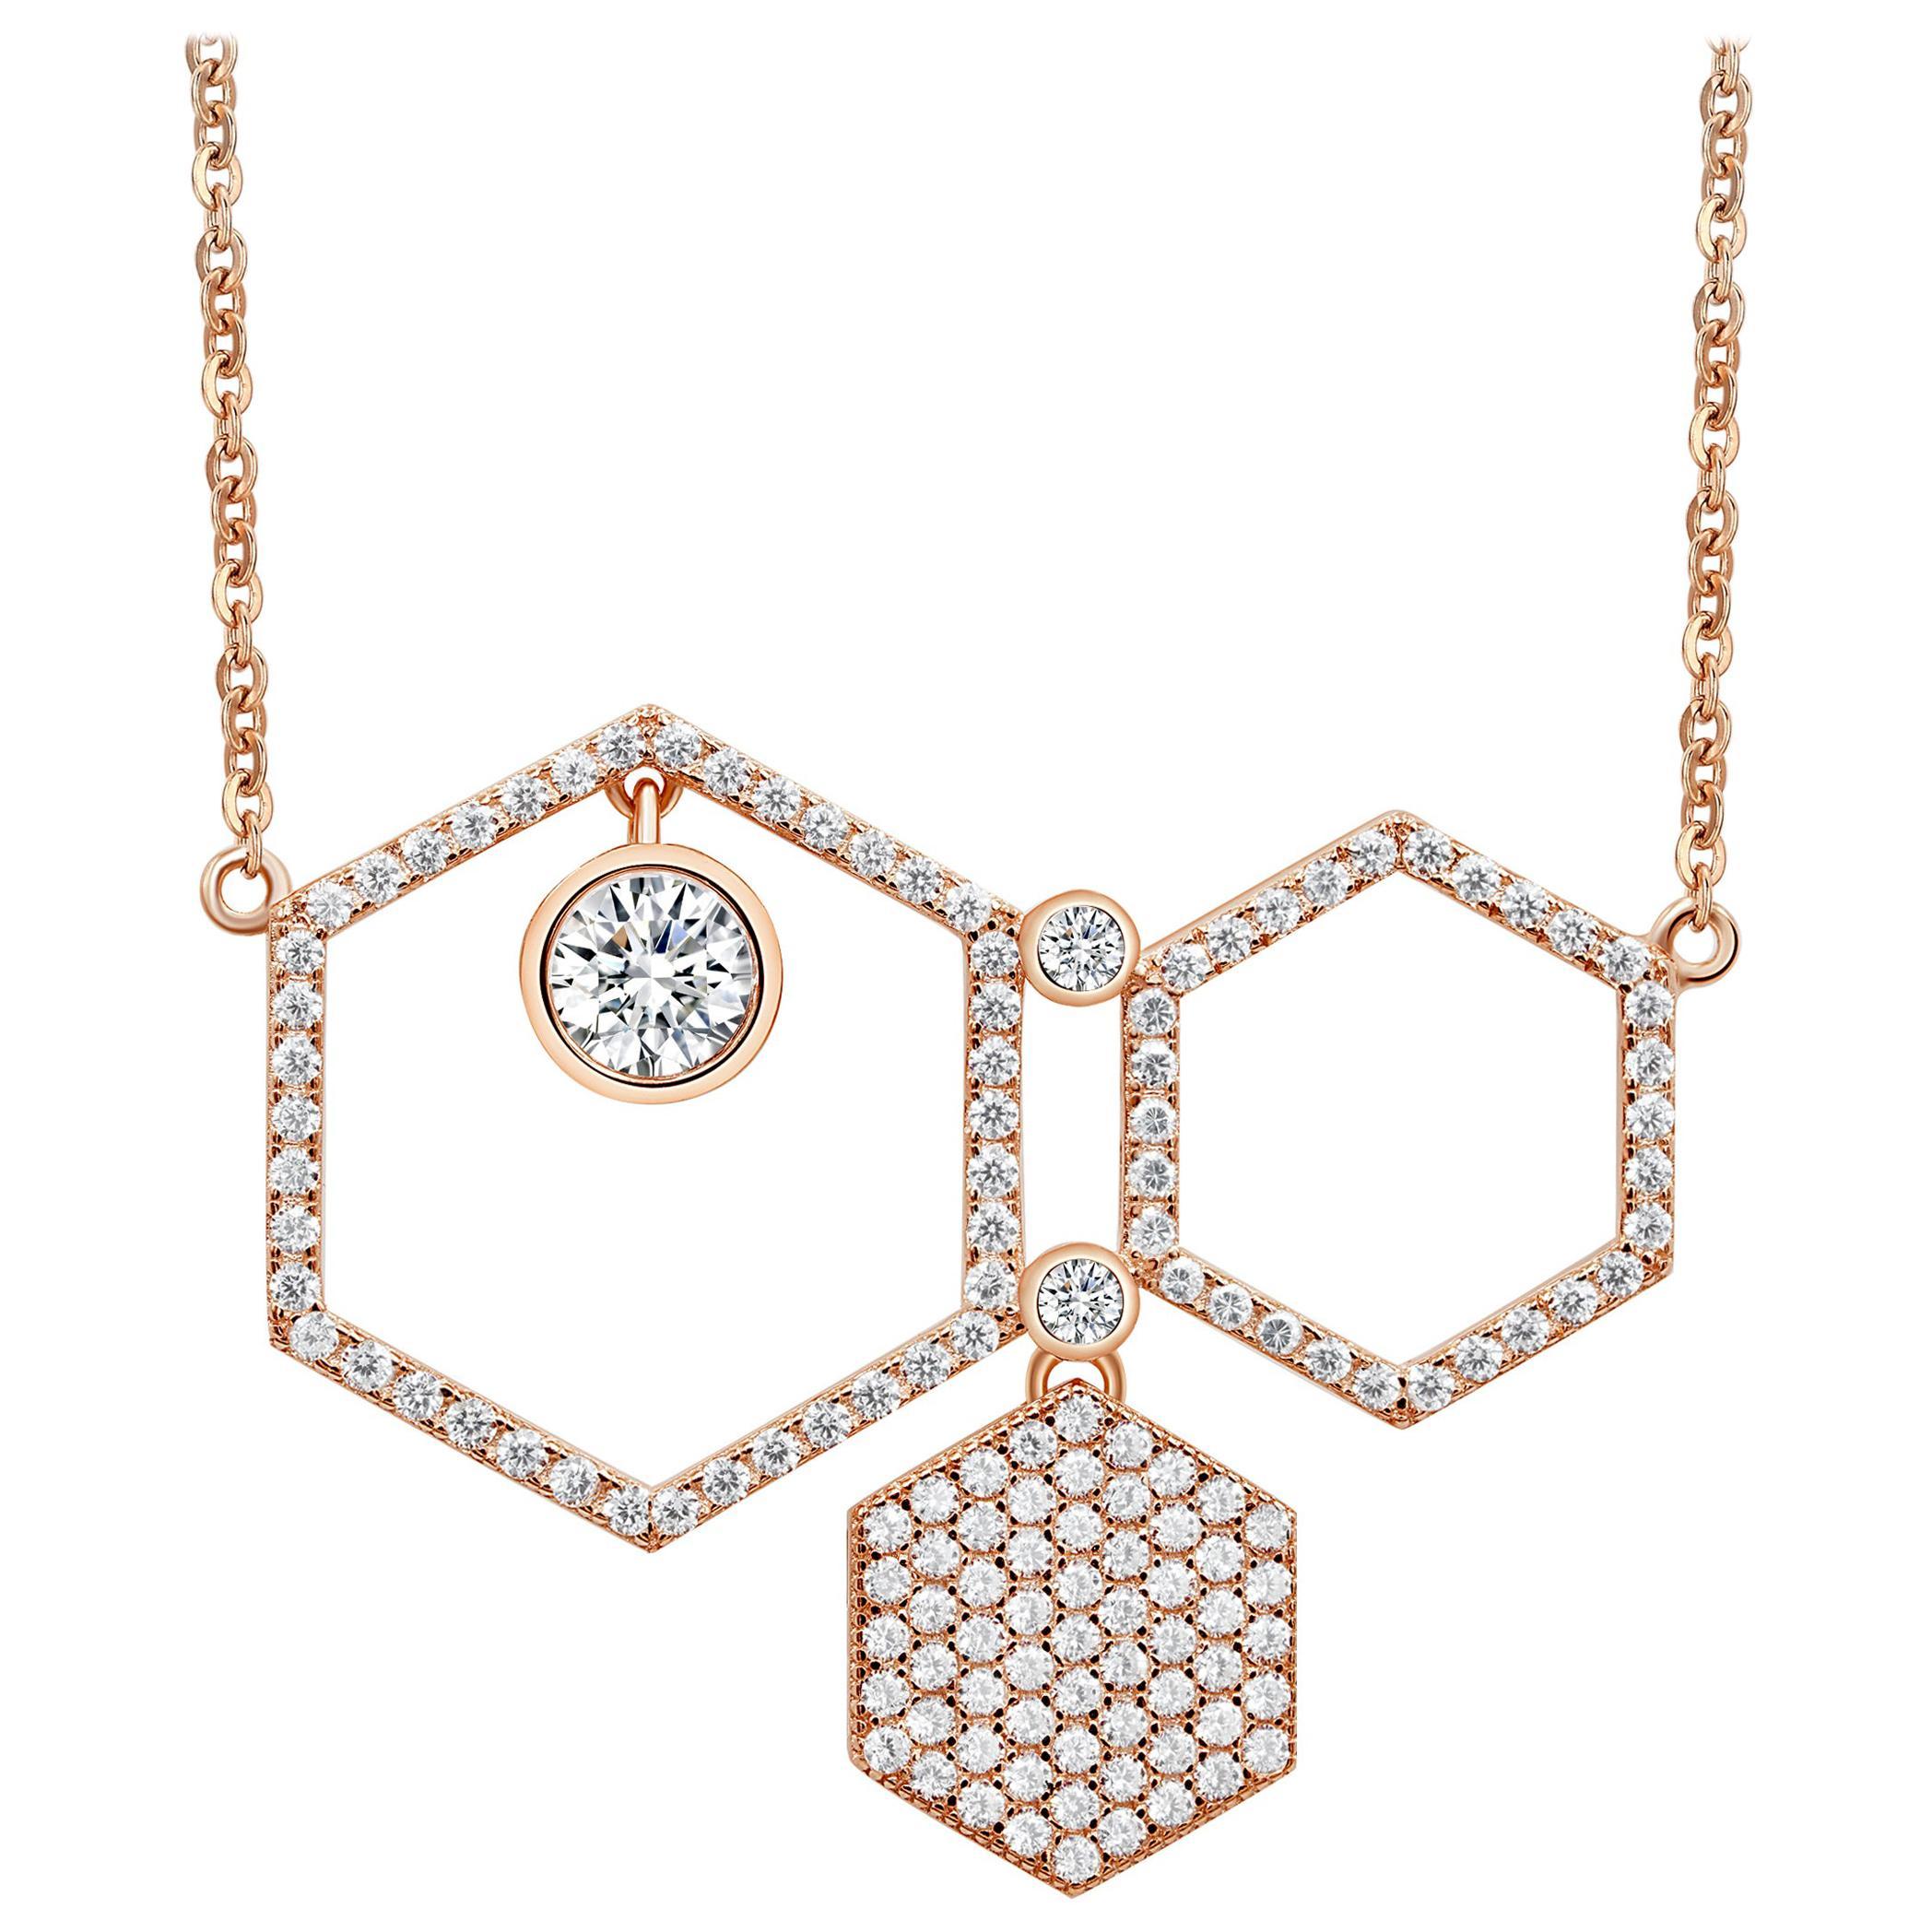 18 Karat Rose Gold Diamond Honey Drop Pave Necklace